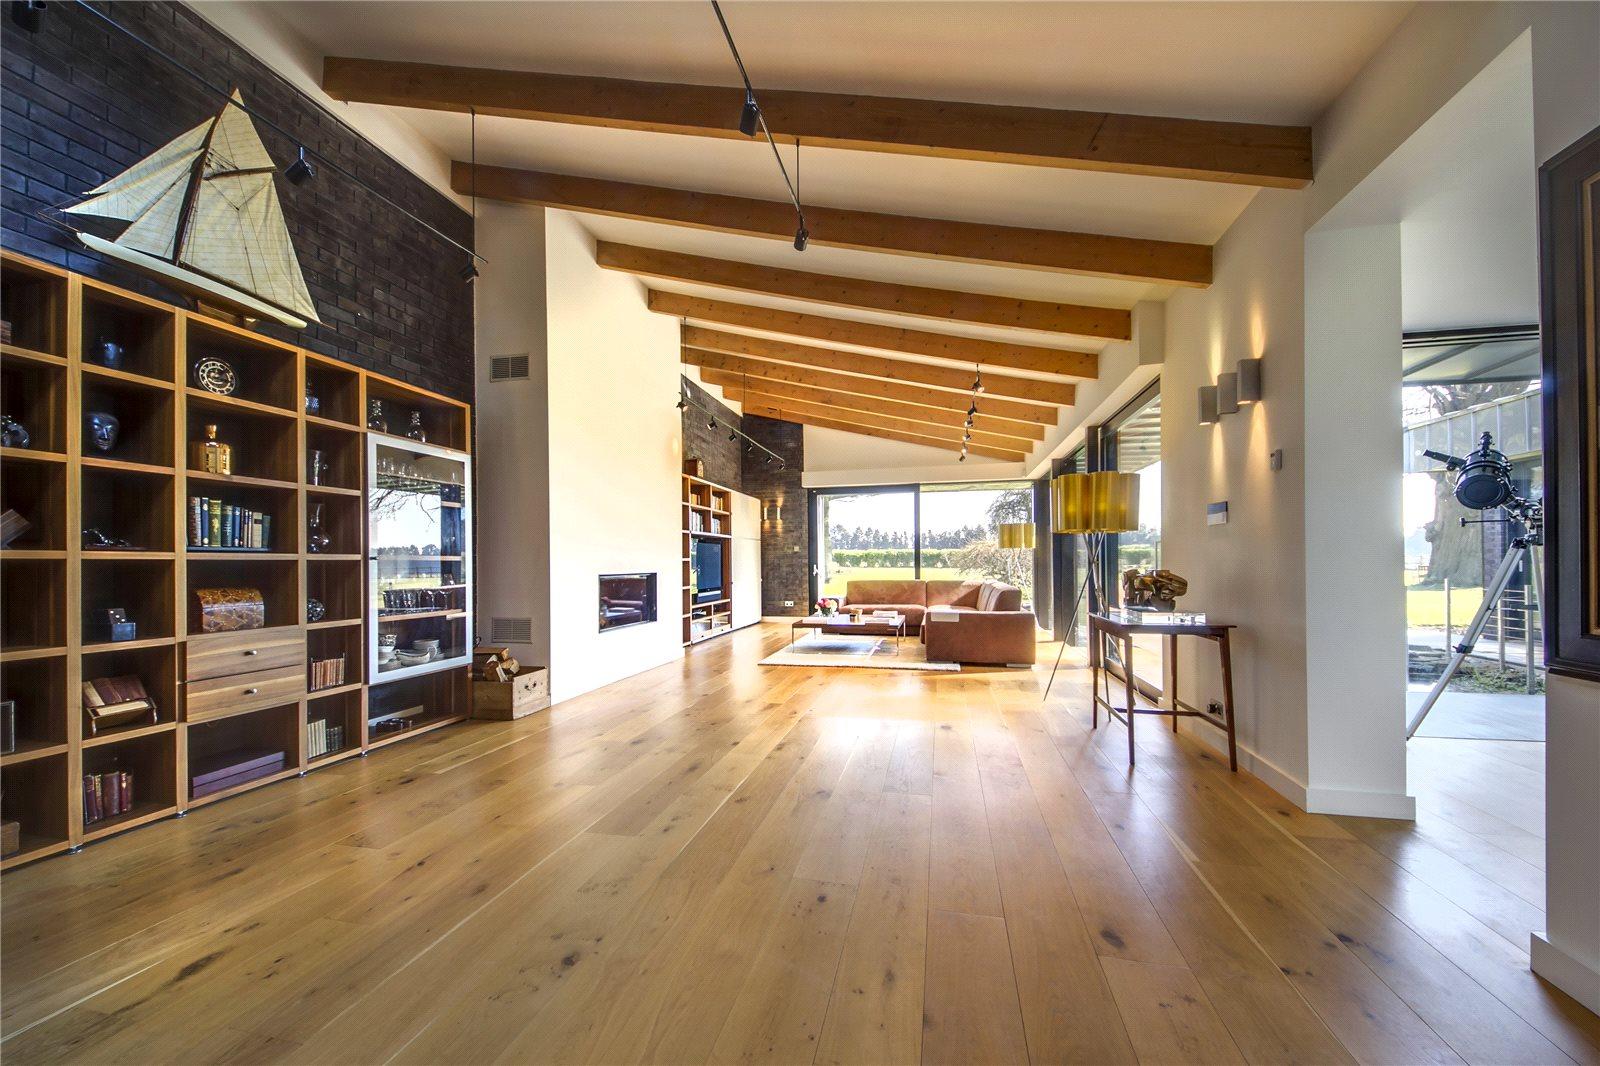 Architects Journal,Lounge